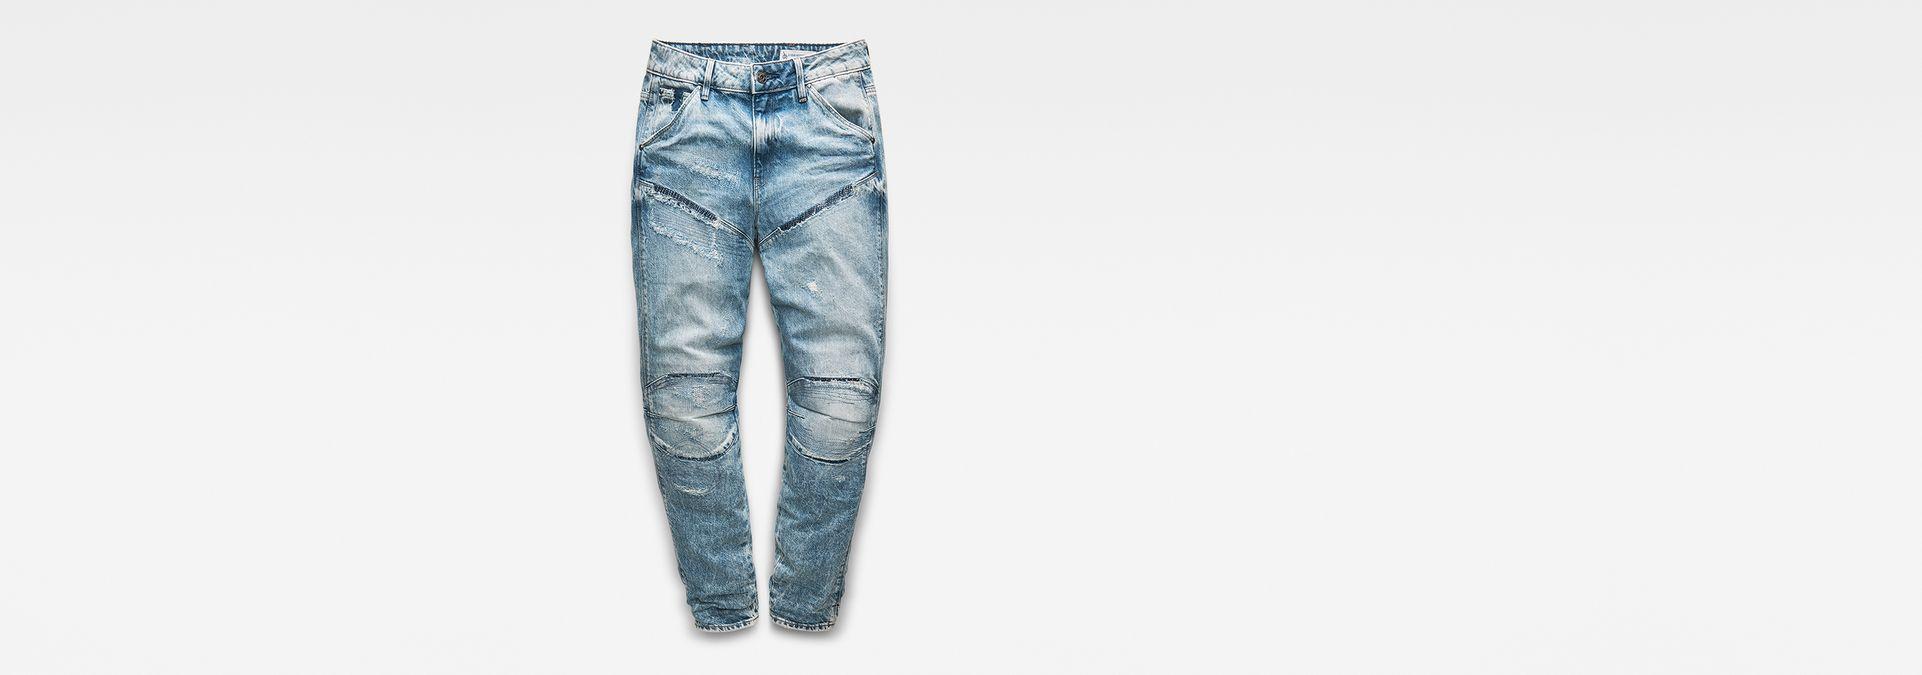 5620 g star elwood 3d mid waist boyfriend jeans g star raw. Black Bedroom Furniture Sets. Home Design Ideas